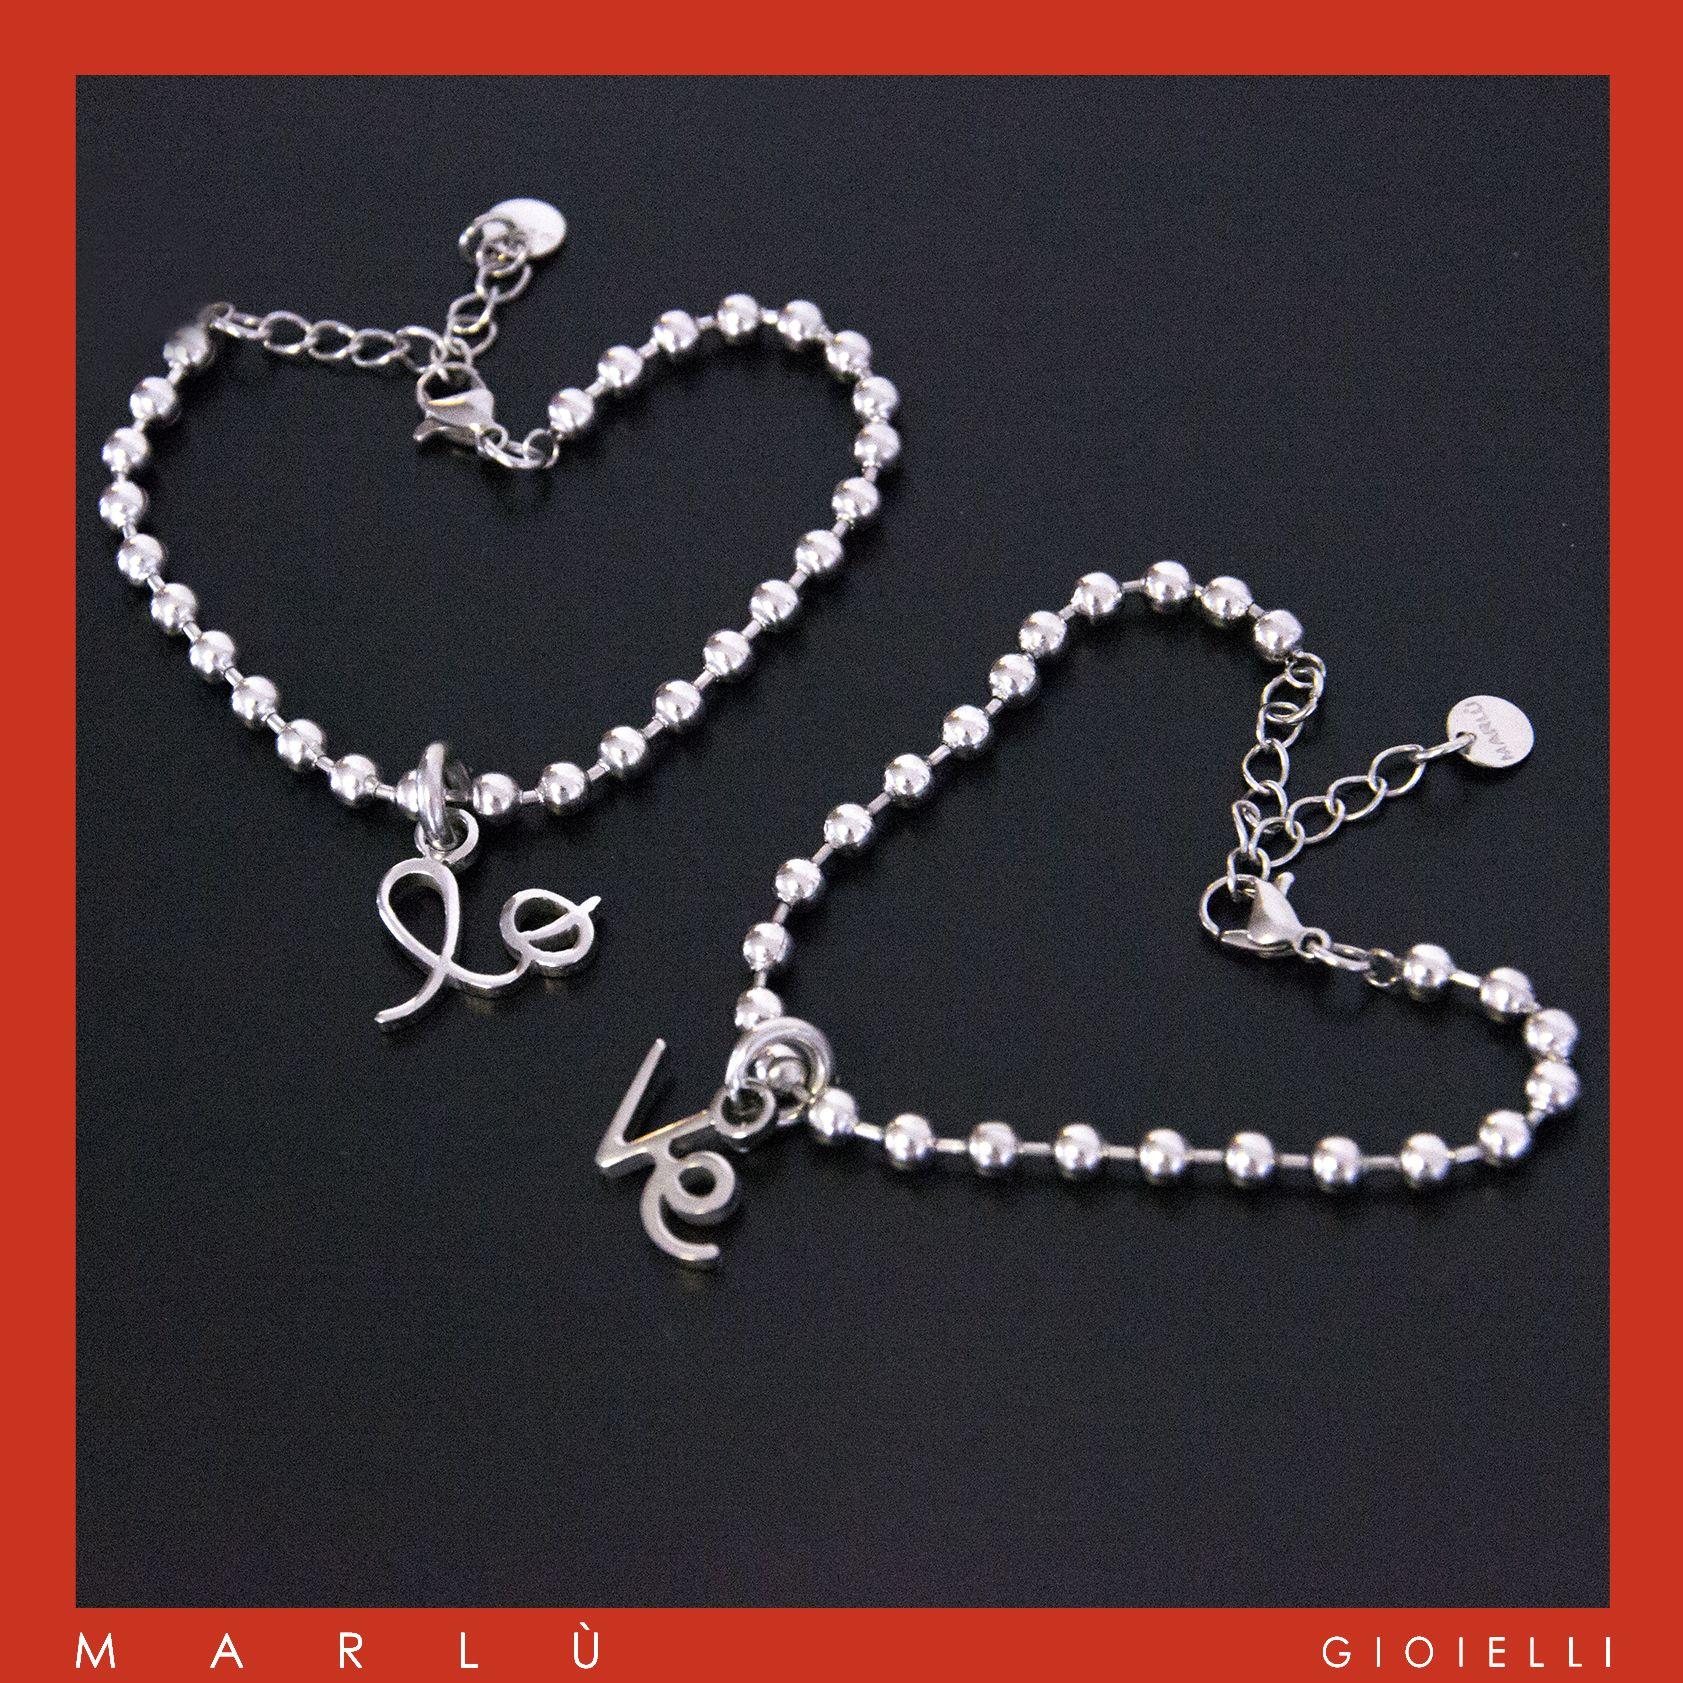 Bracciali in acciaio con charms lo-ve da condividere con chi vuoi. Collezione #MYLOVE. Steel bracelets with charms lo-ve to share with whoever you want. #MYLOVE Collection